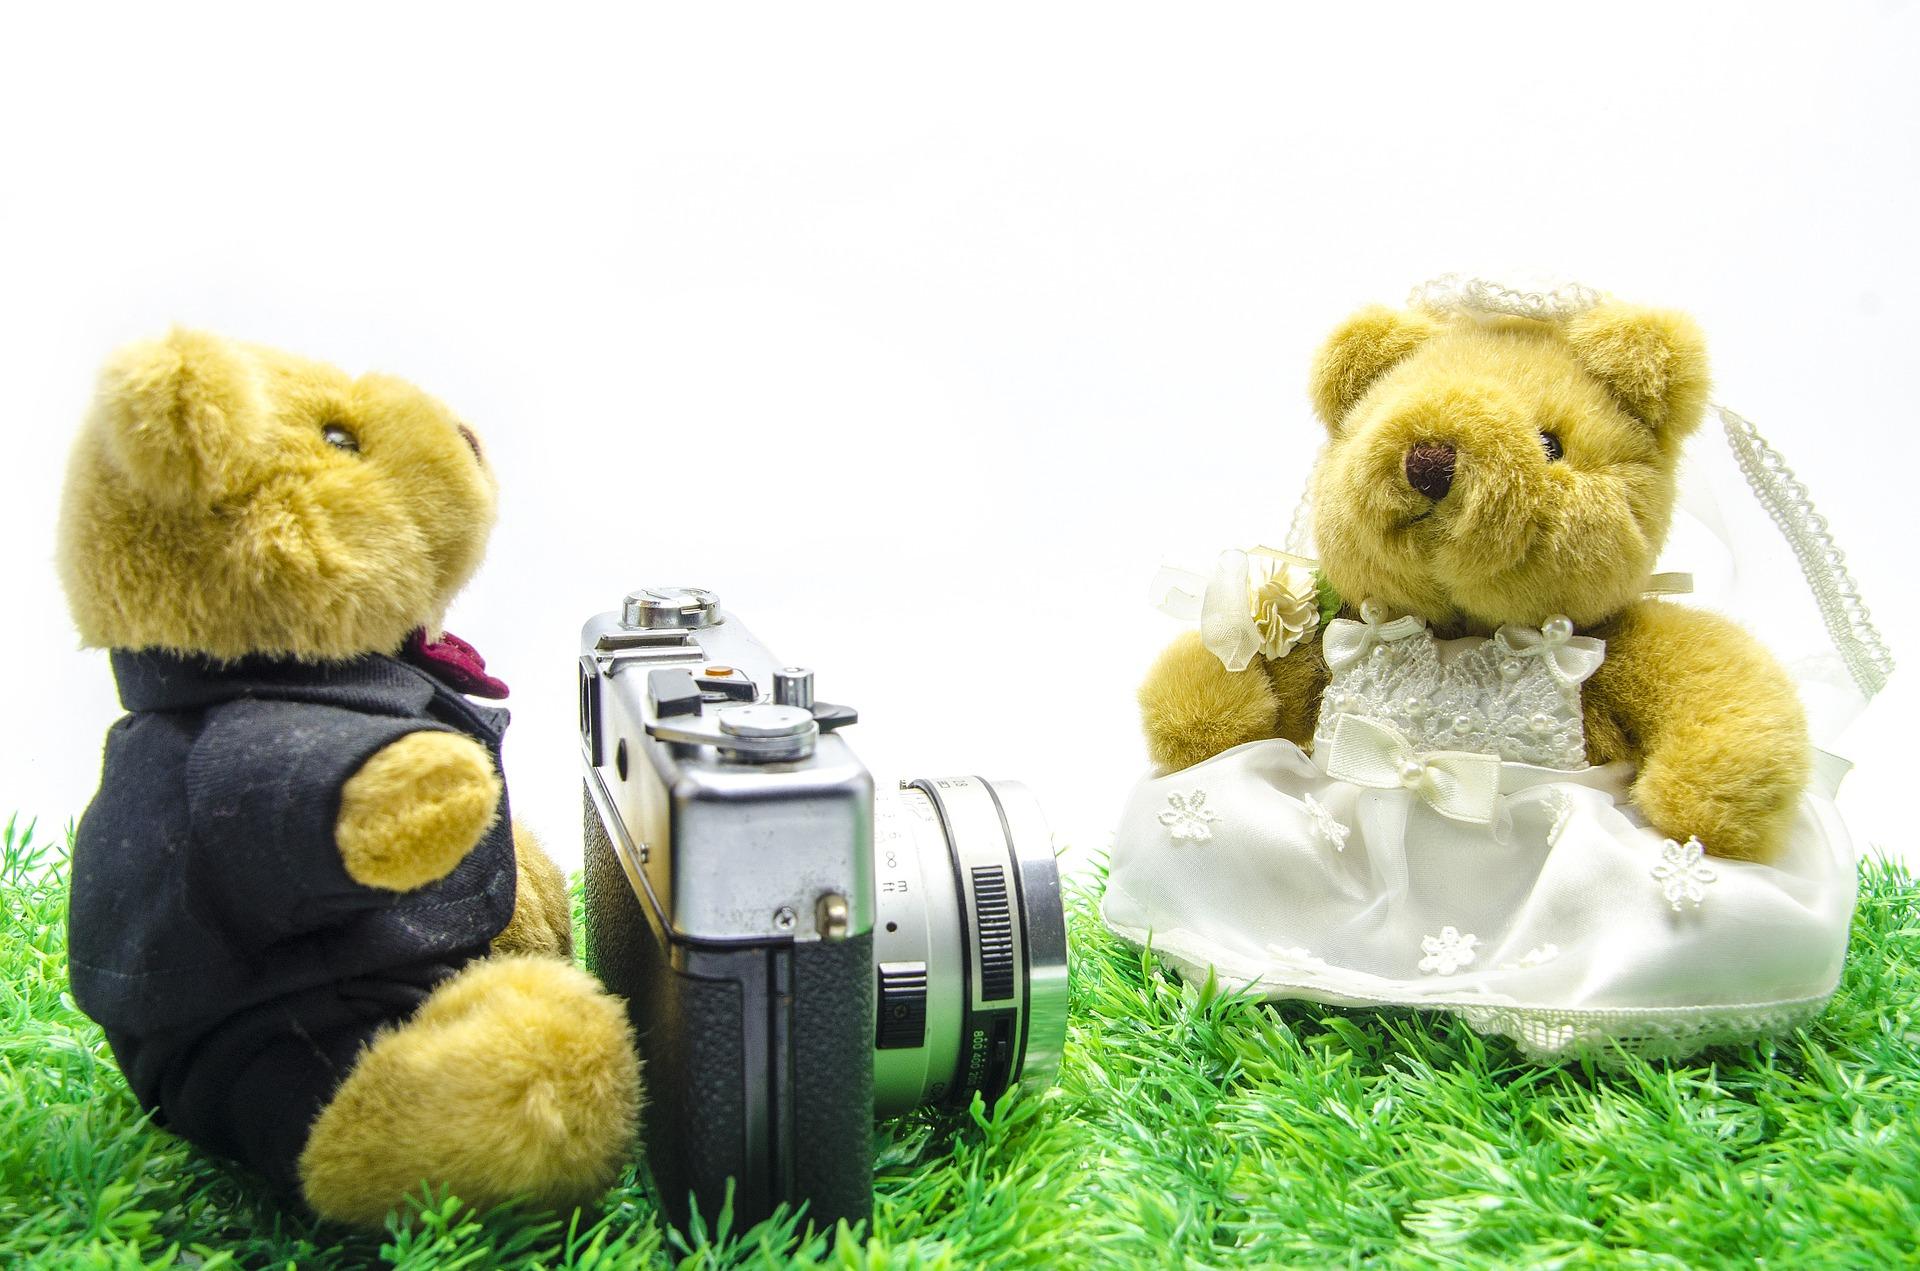 svatba medvědů